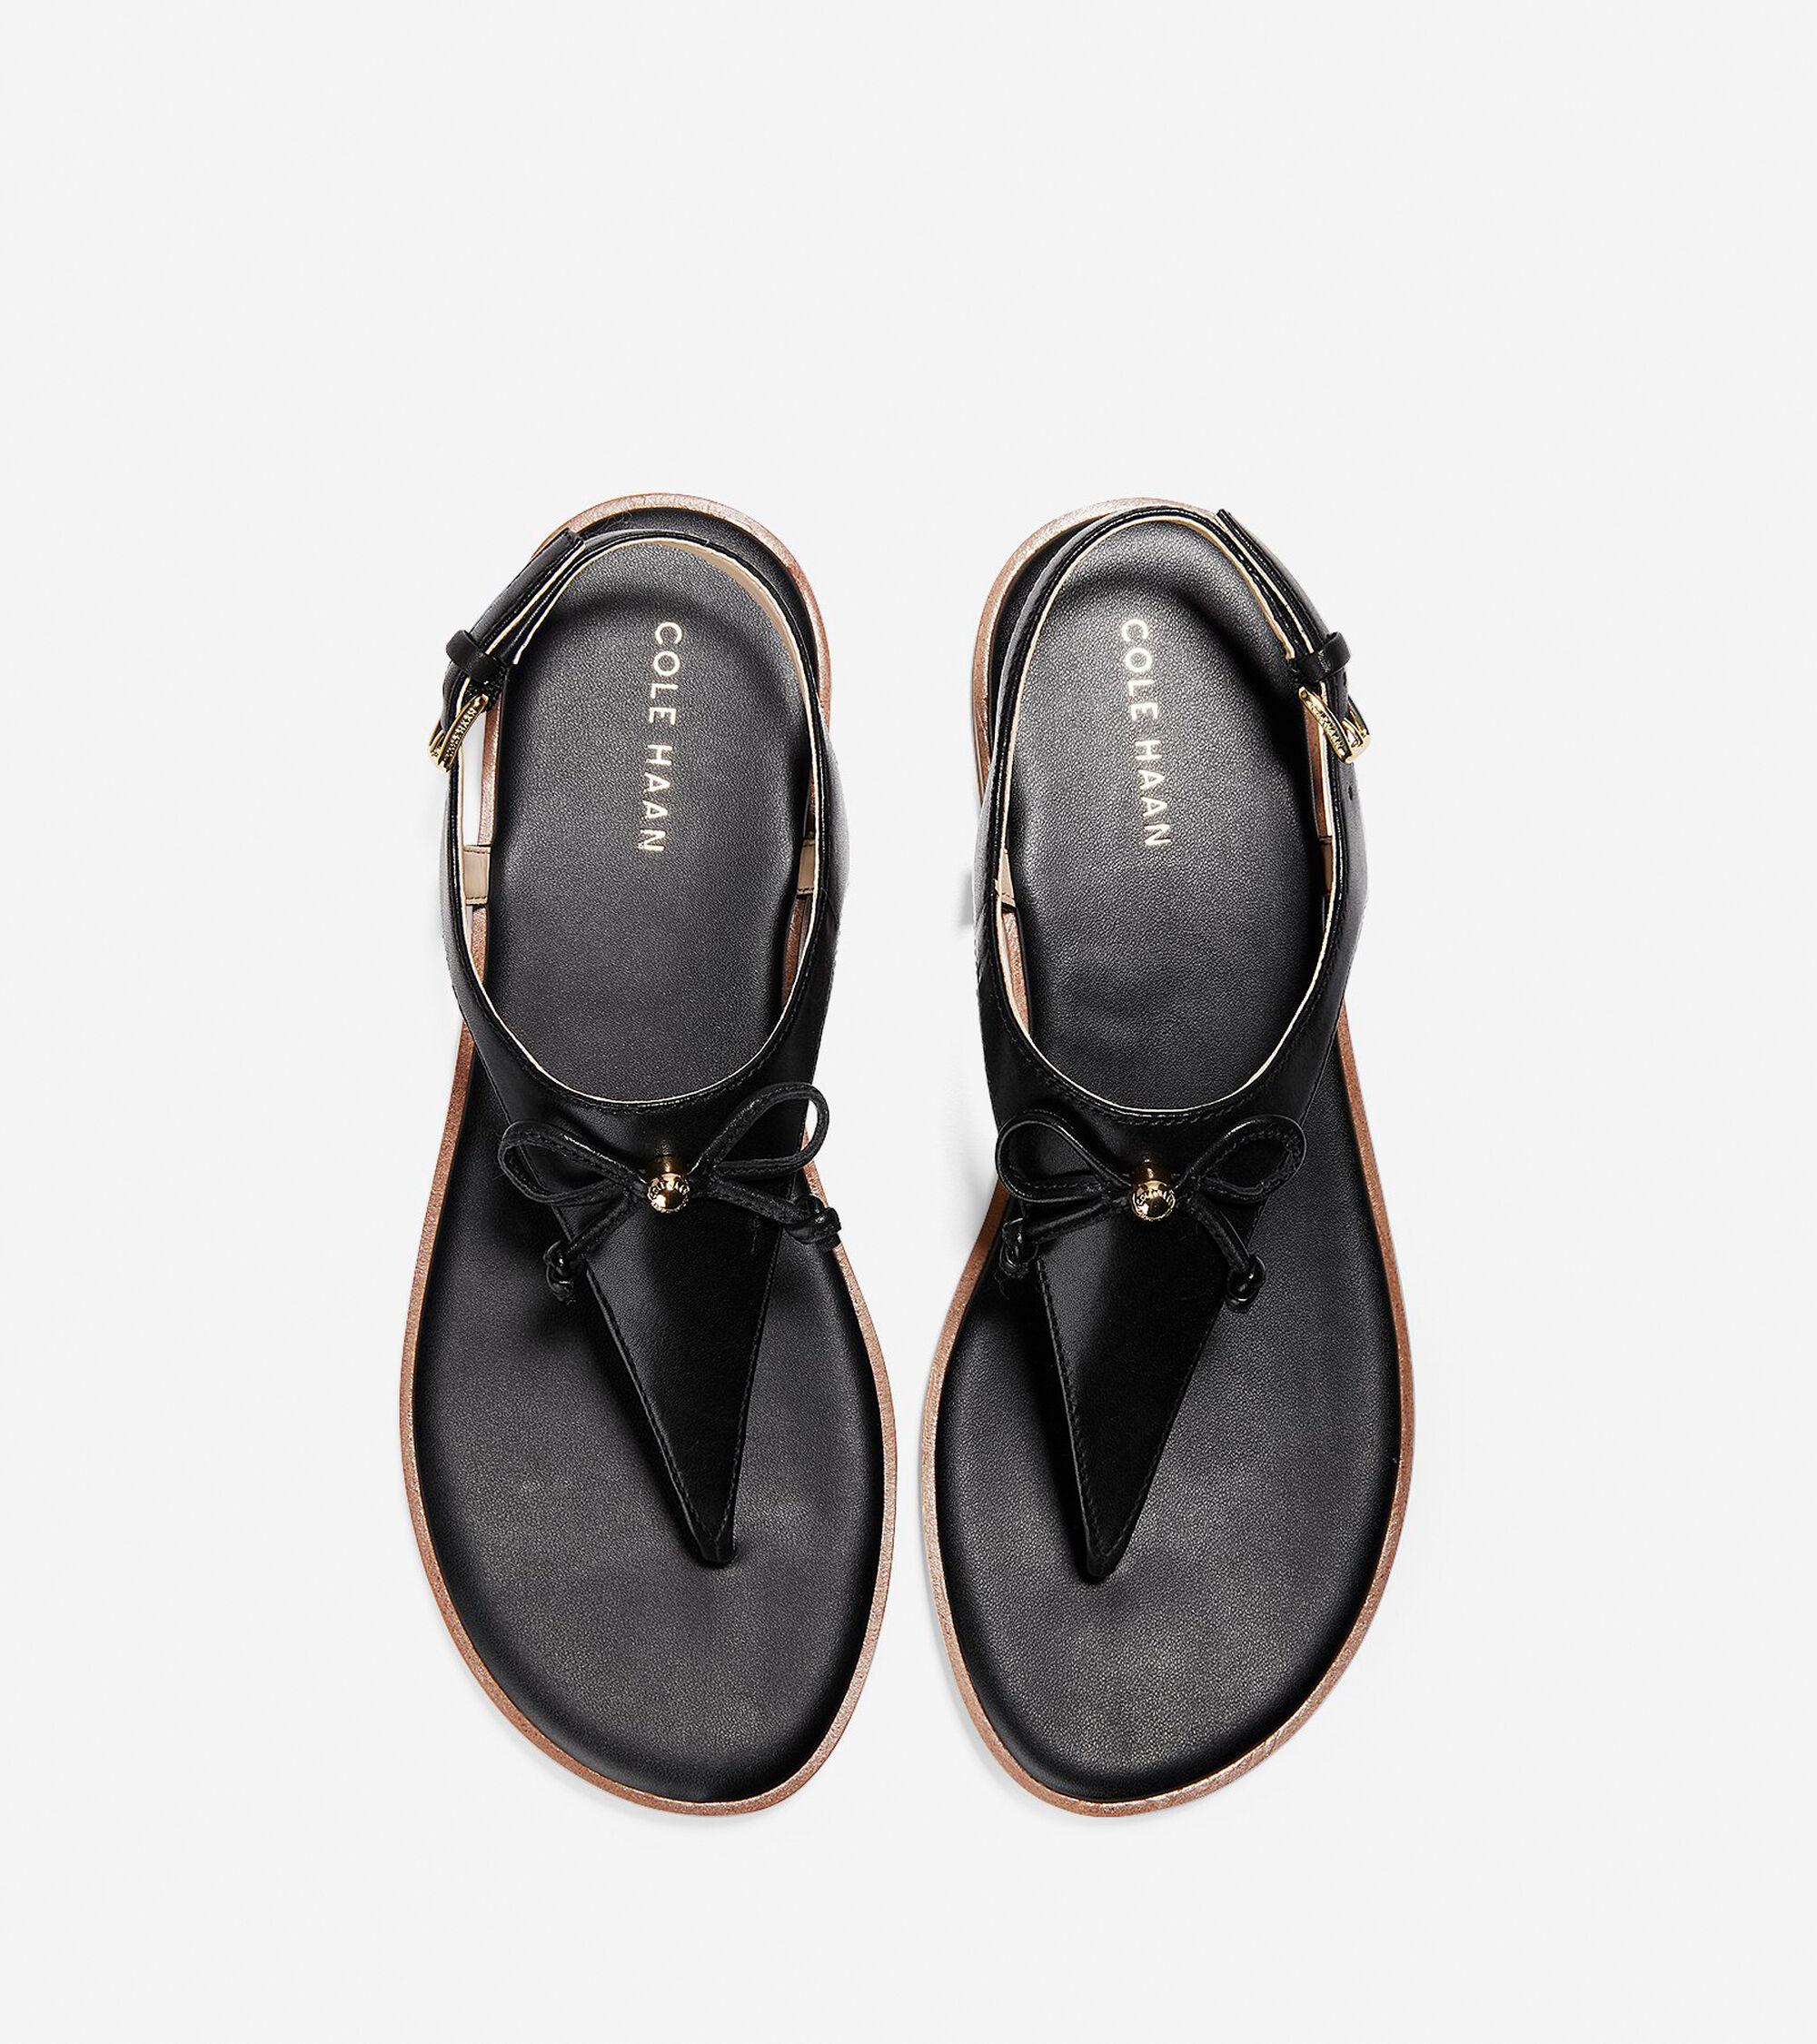 f92190605b55 Findra Thong Sandal · Findra Thong Sandal · Findra Thong Sandal · Findra Thong  Sandal.  COLEHAAN